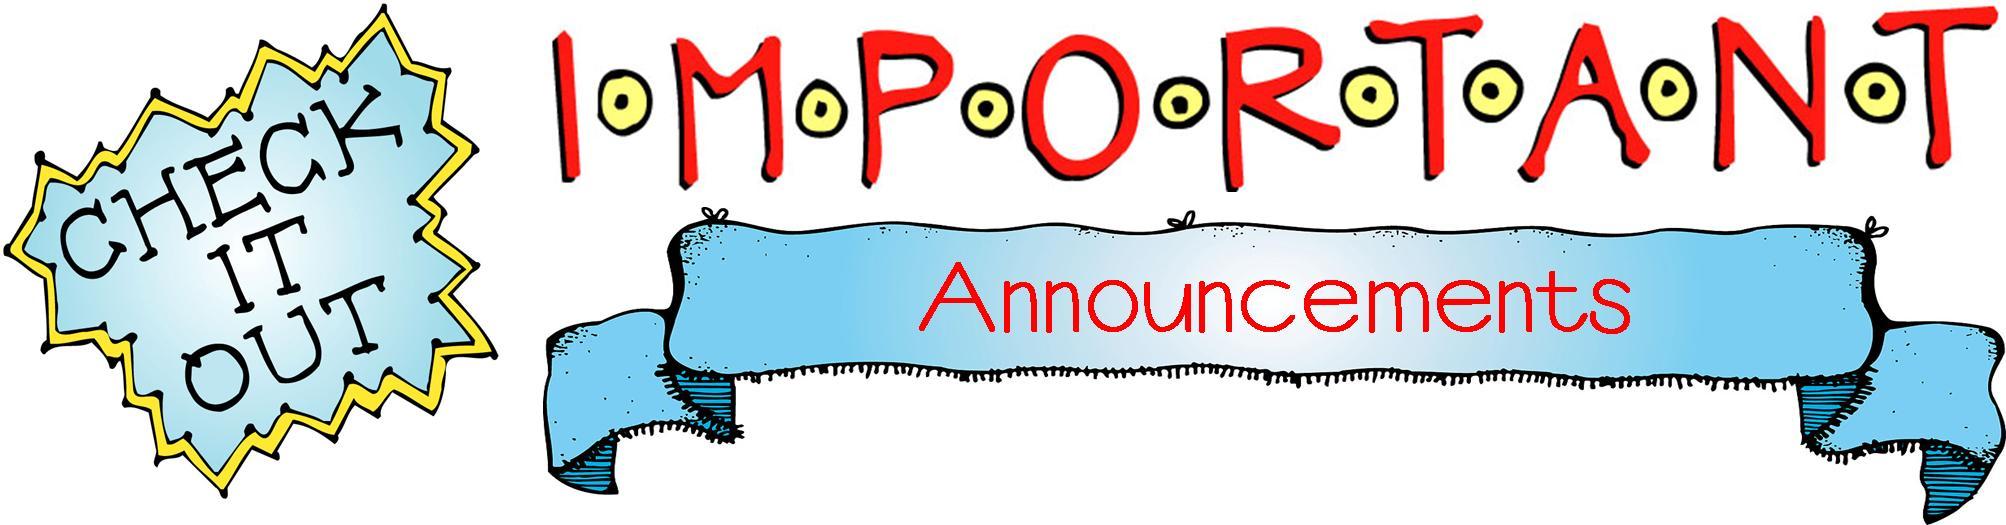 Announcement Clip Art-Announcement Clip Art-8